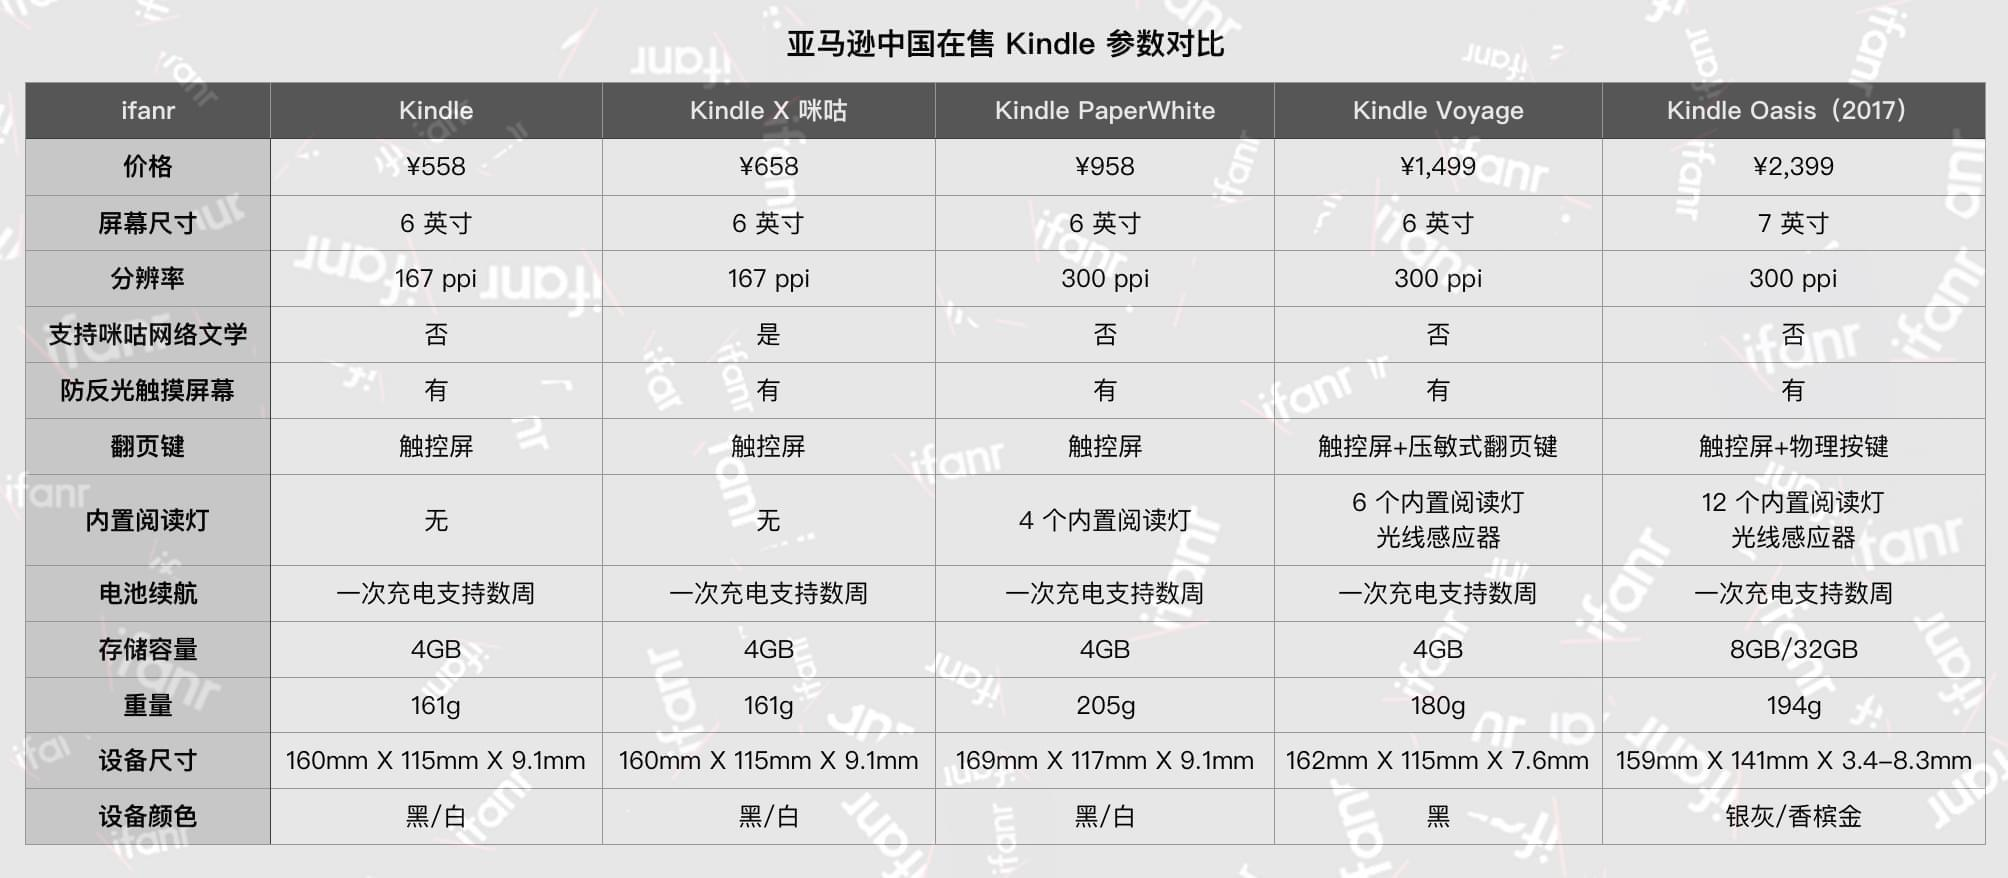 Kindle�版���板��甯�锛�7�卞�稿�骞�锛��借���浠�2399��